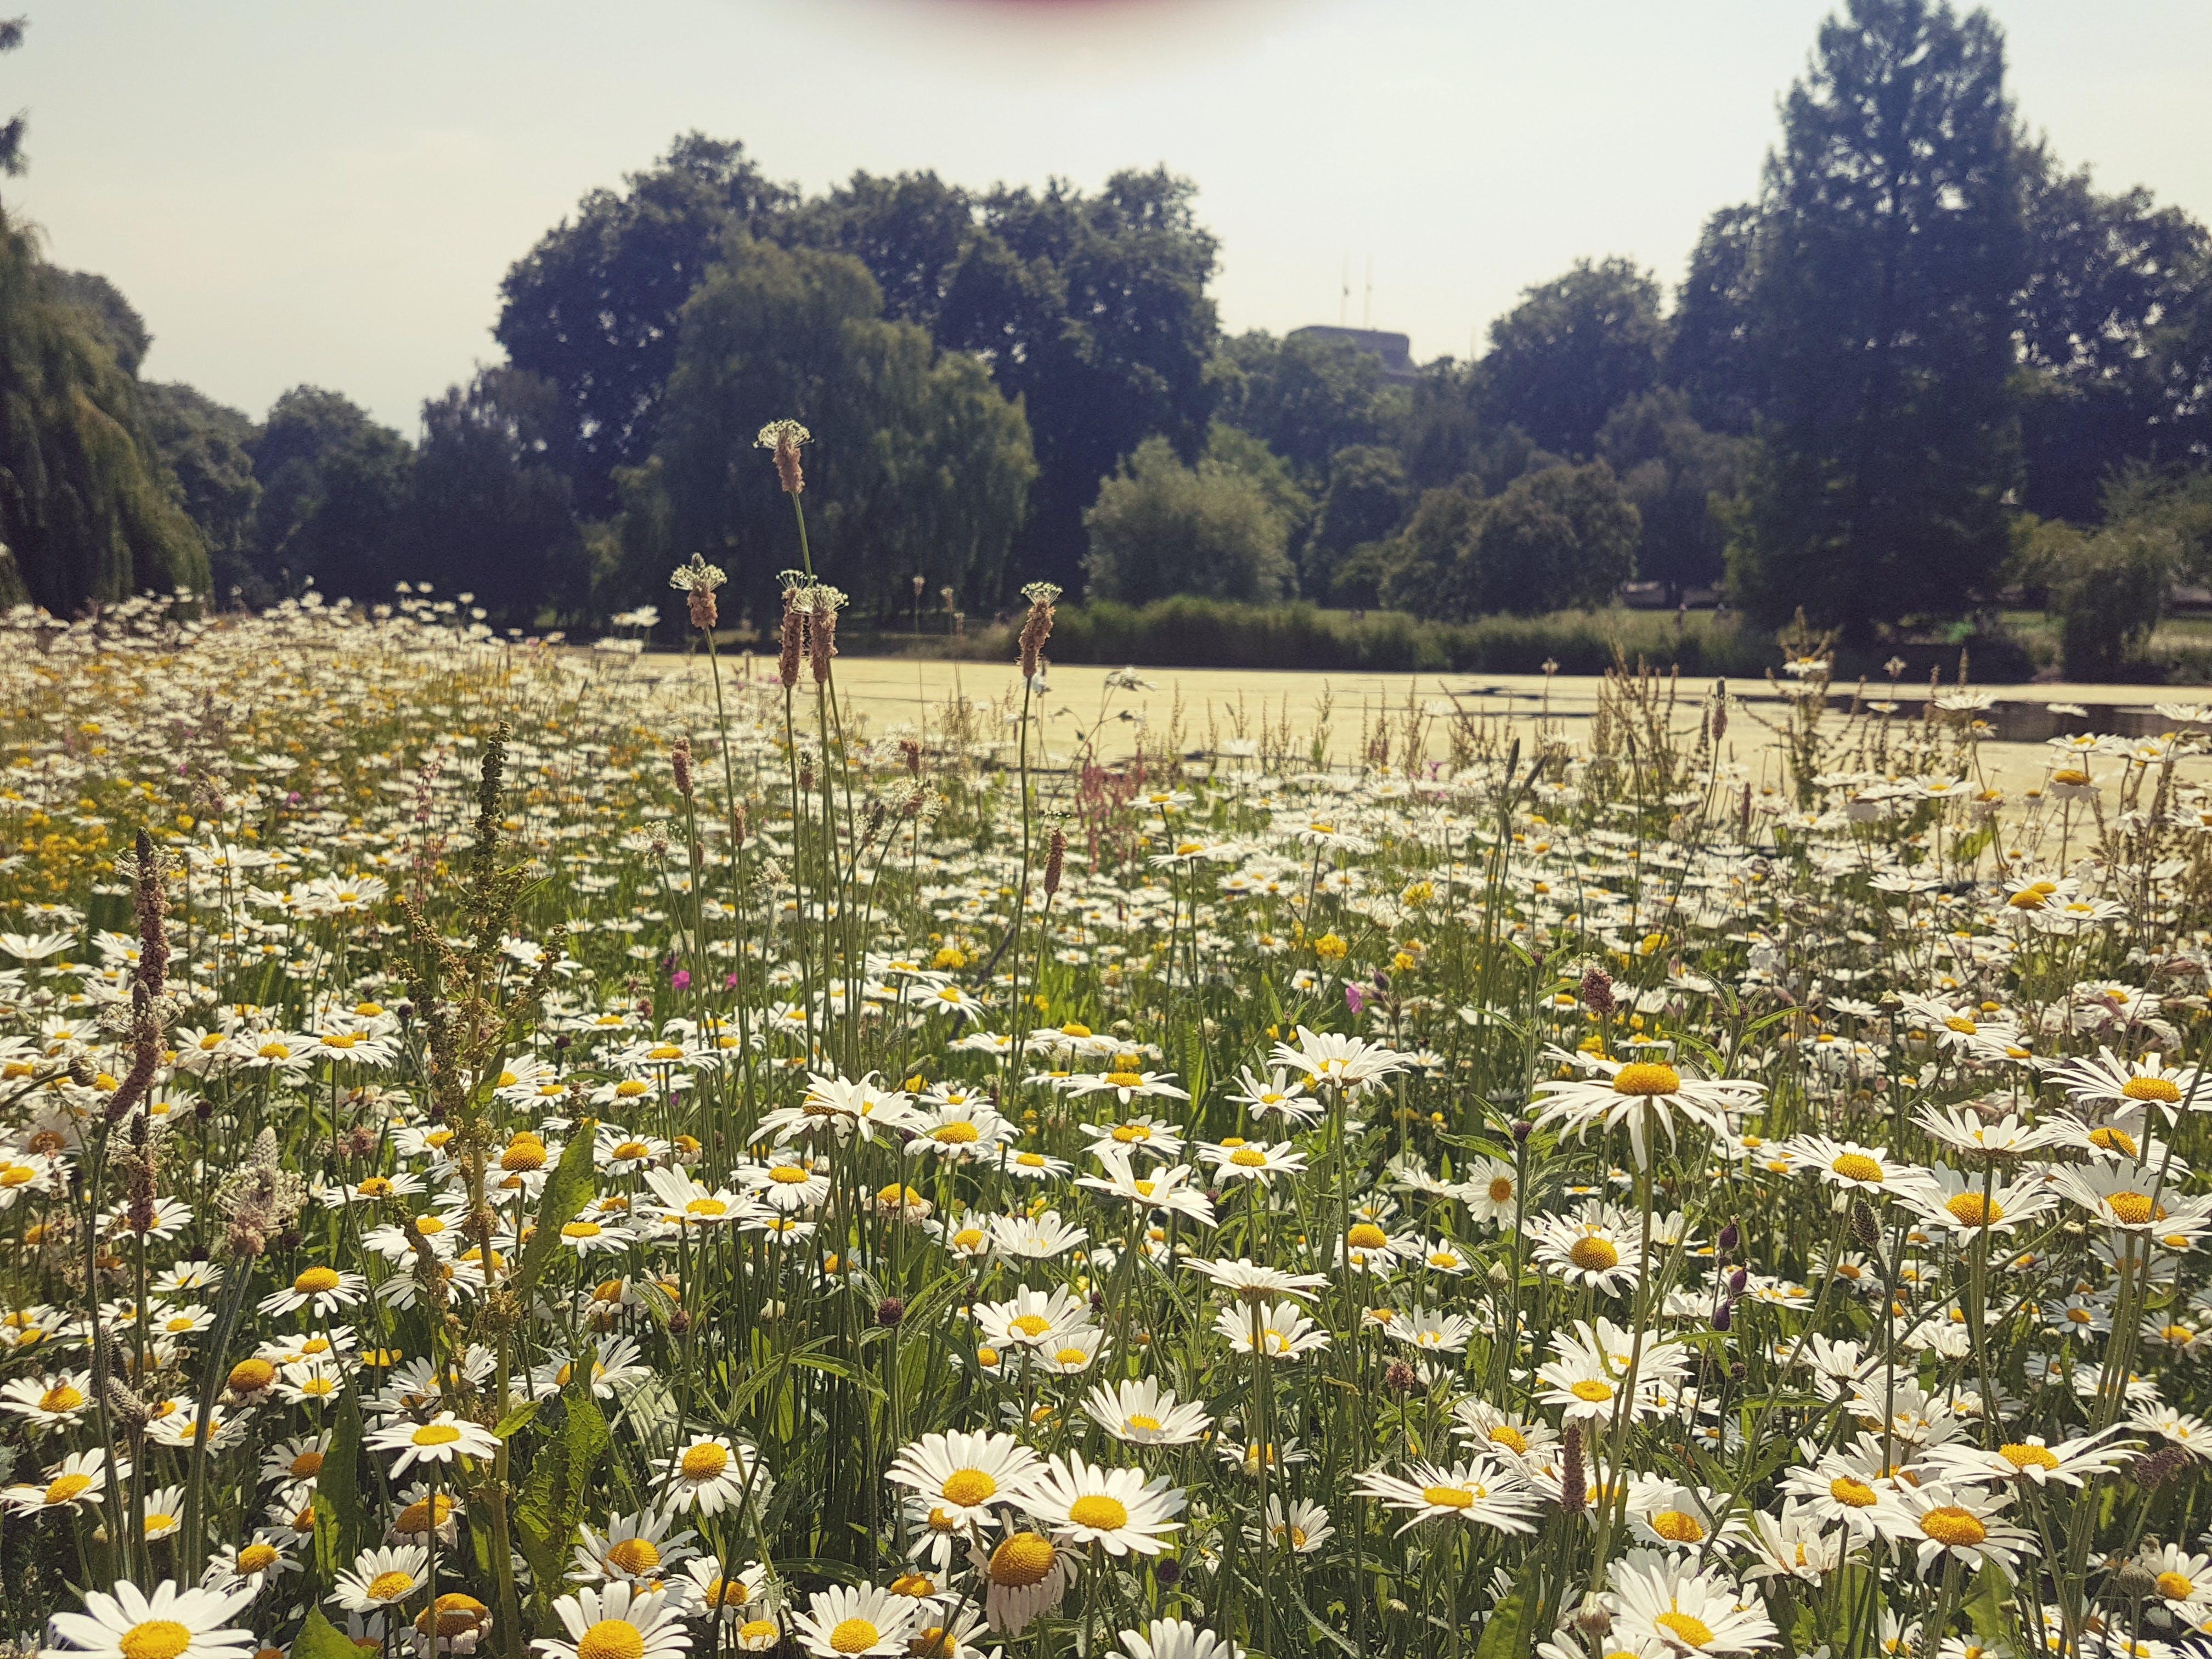 Free stock photo of summer, white daisies